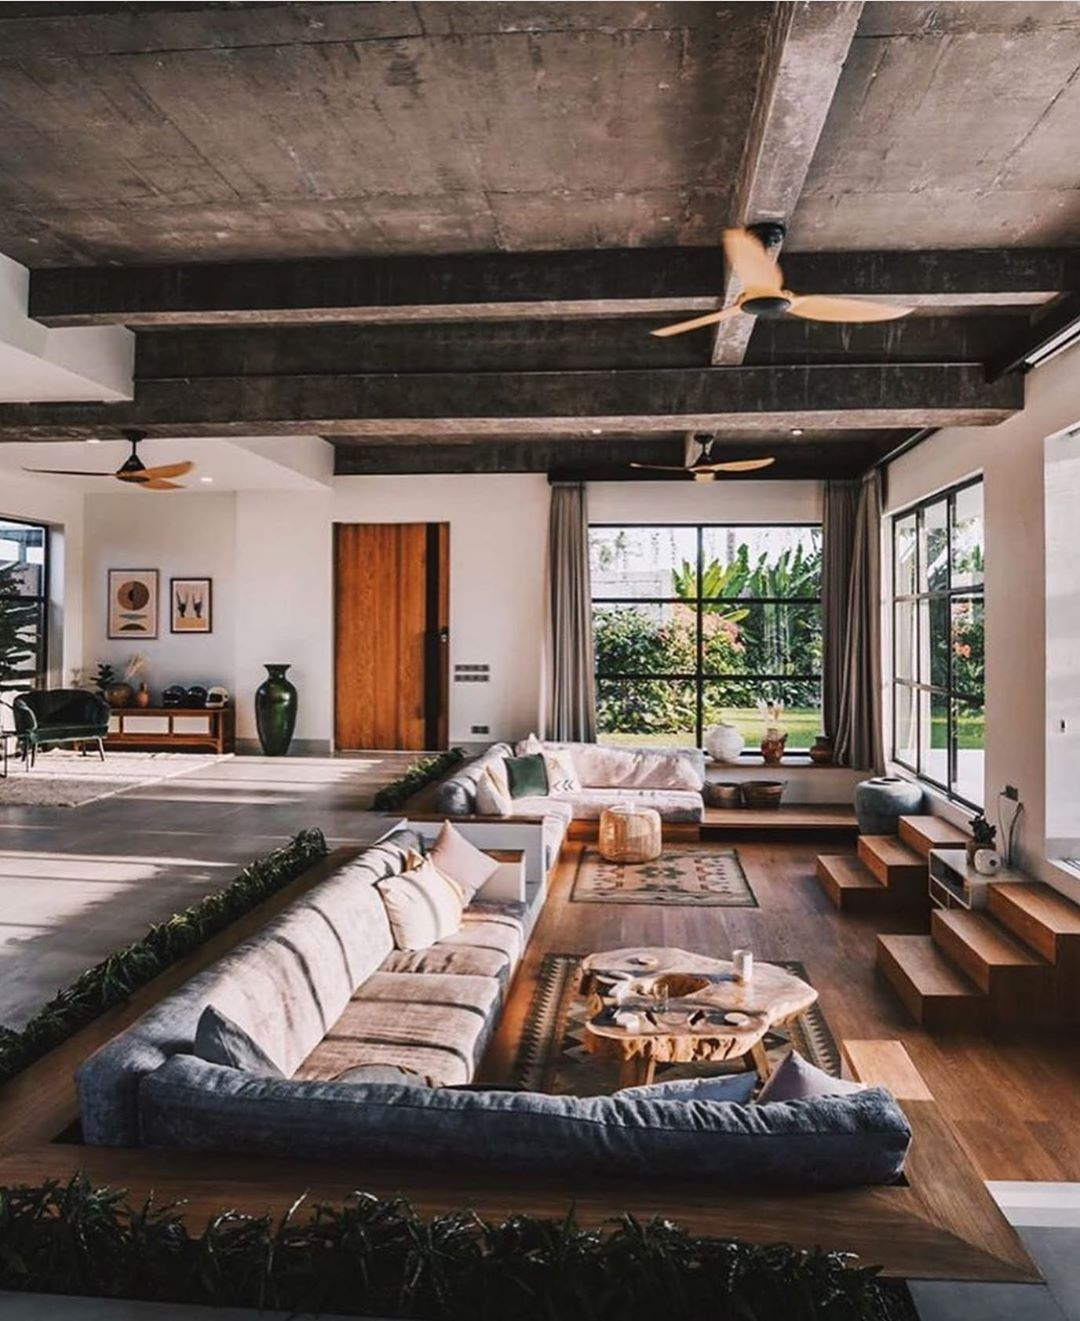 Sunken Living Room Wild Country Fine Arts Sunken living room means